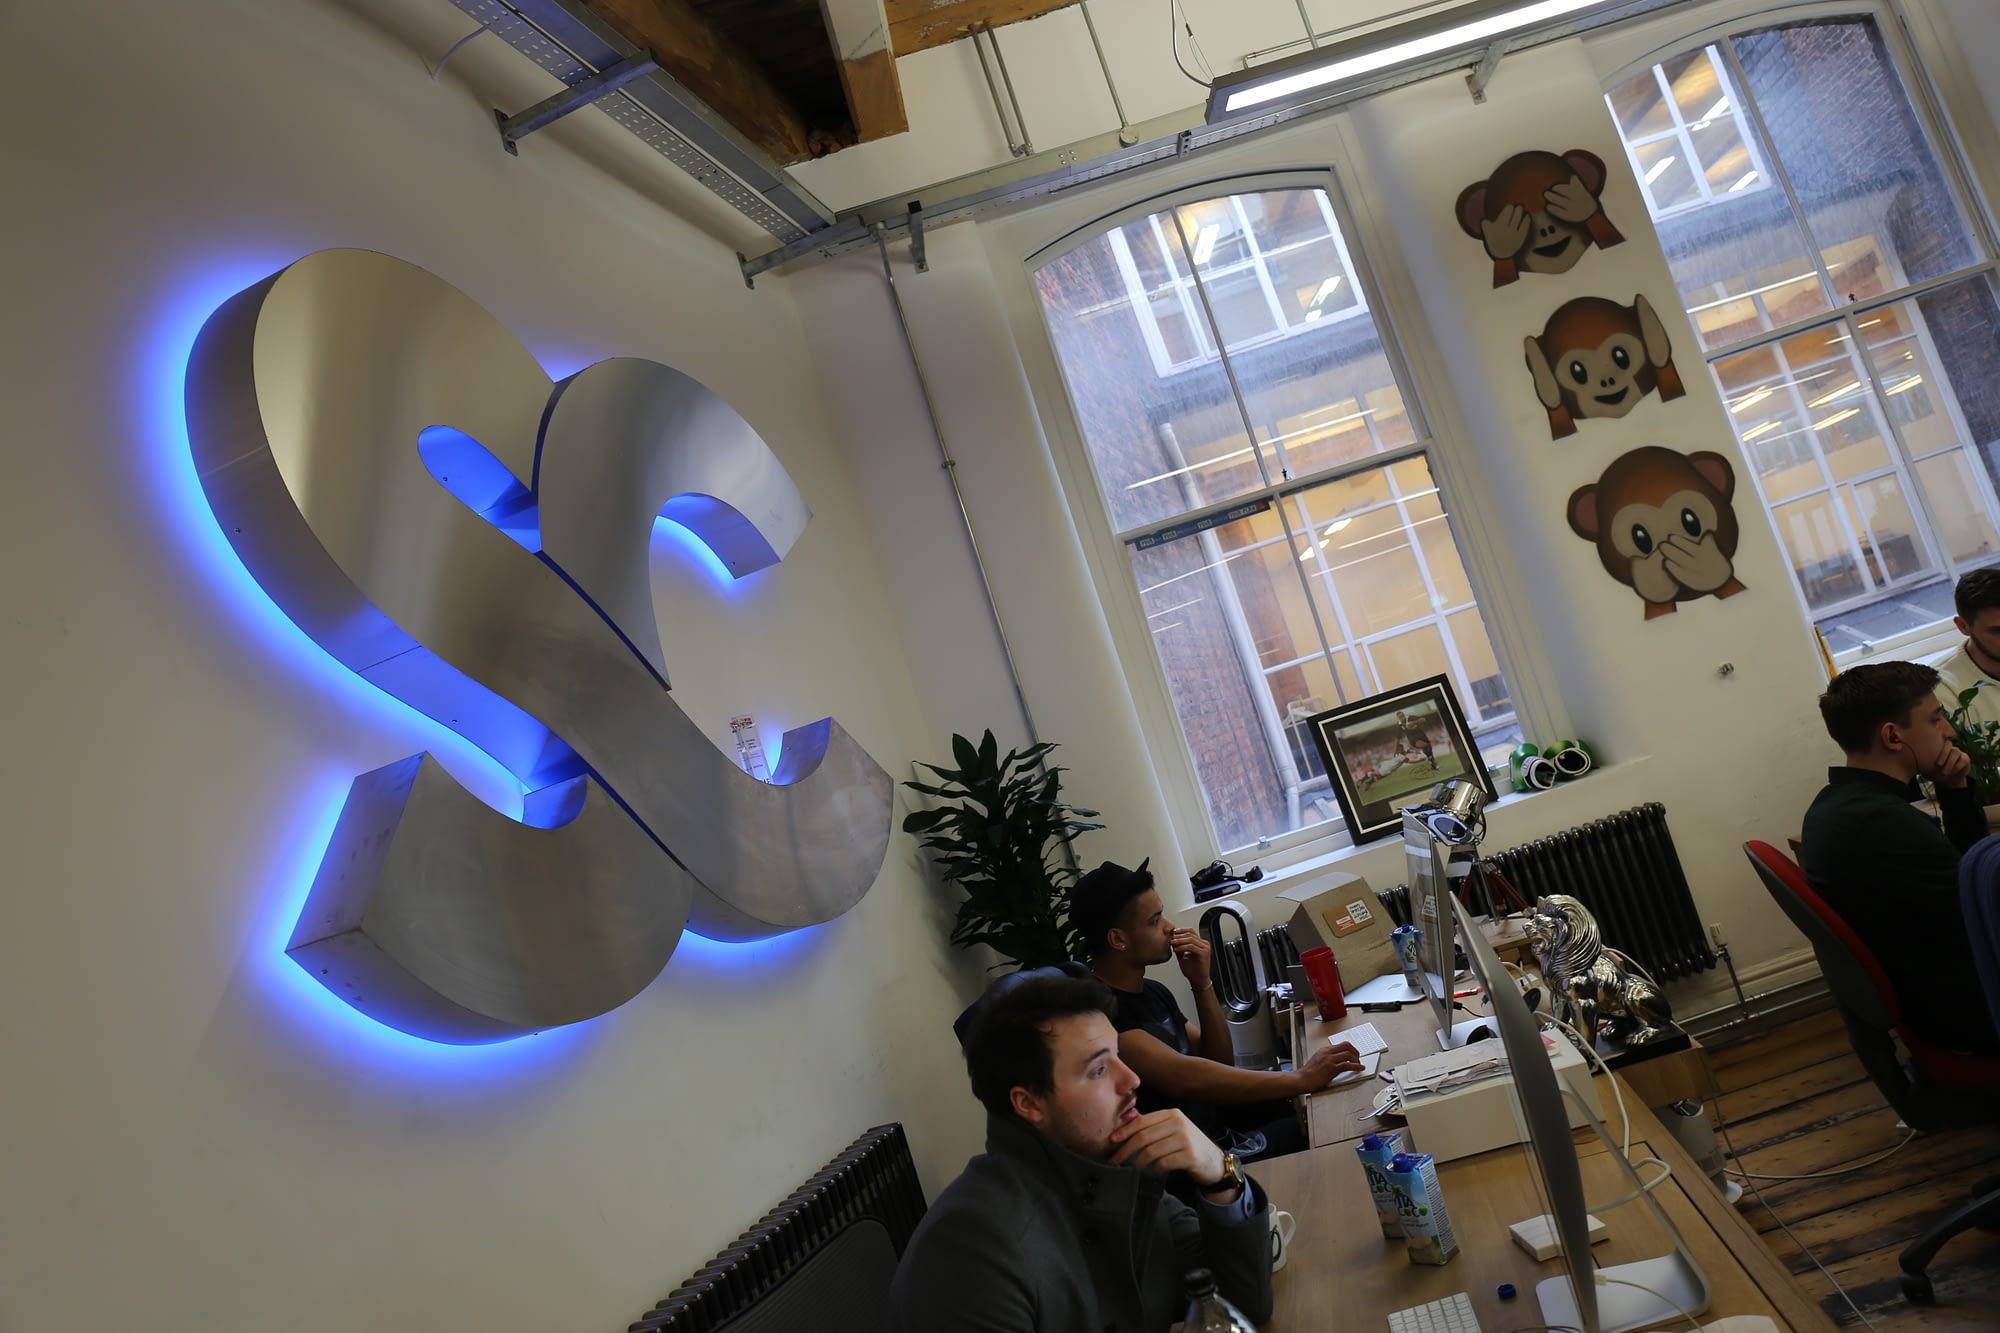 Social Chain co-founders Steve Bartlett and Dom McGregor